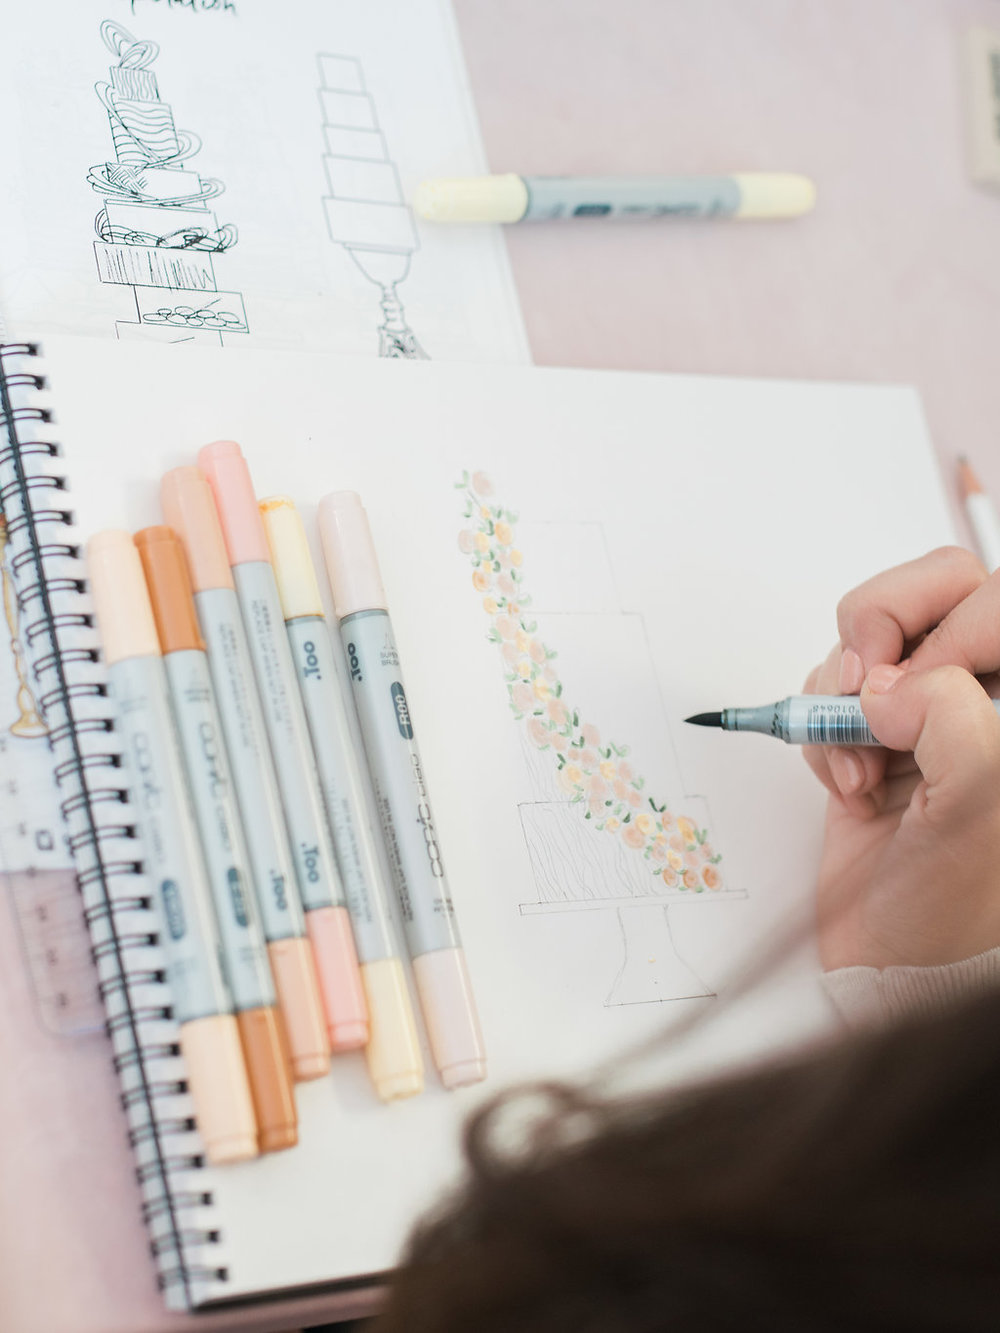 JennySoiPhotography-Sketchbookseries-BTS-150.jpg